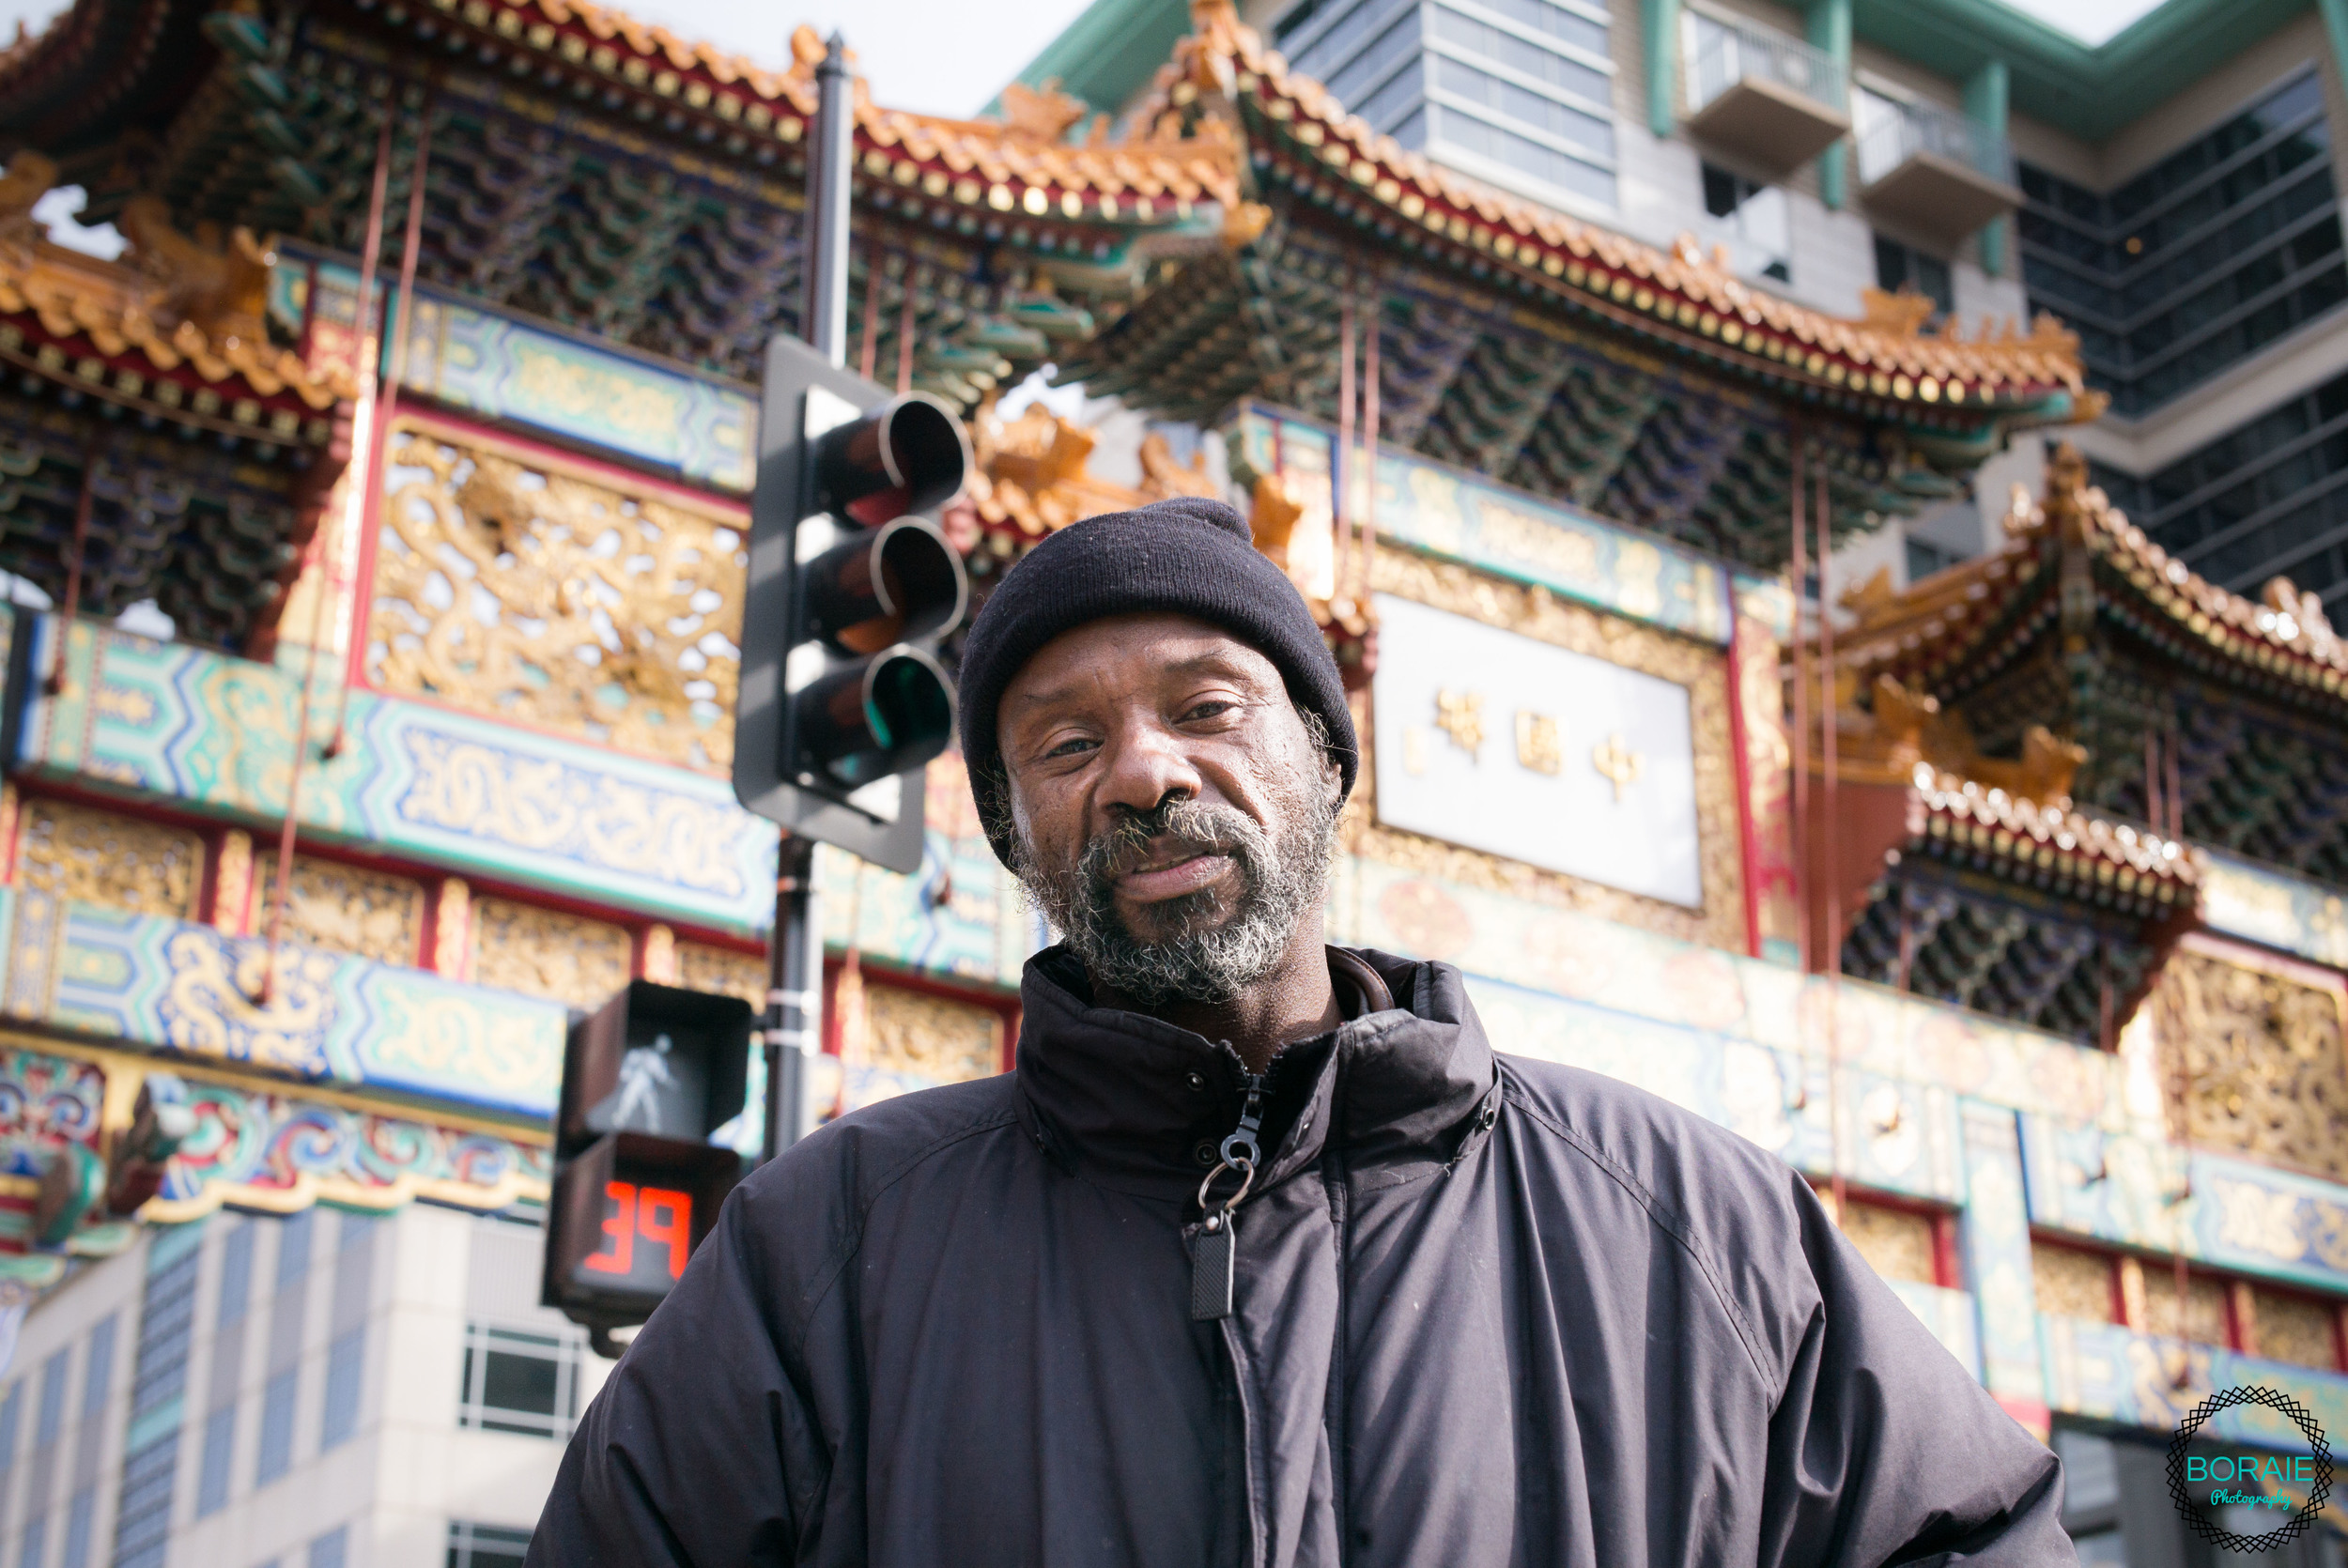 Boraie Photography www.boraiephotography.com -2.JPG